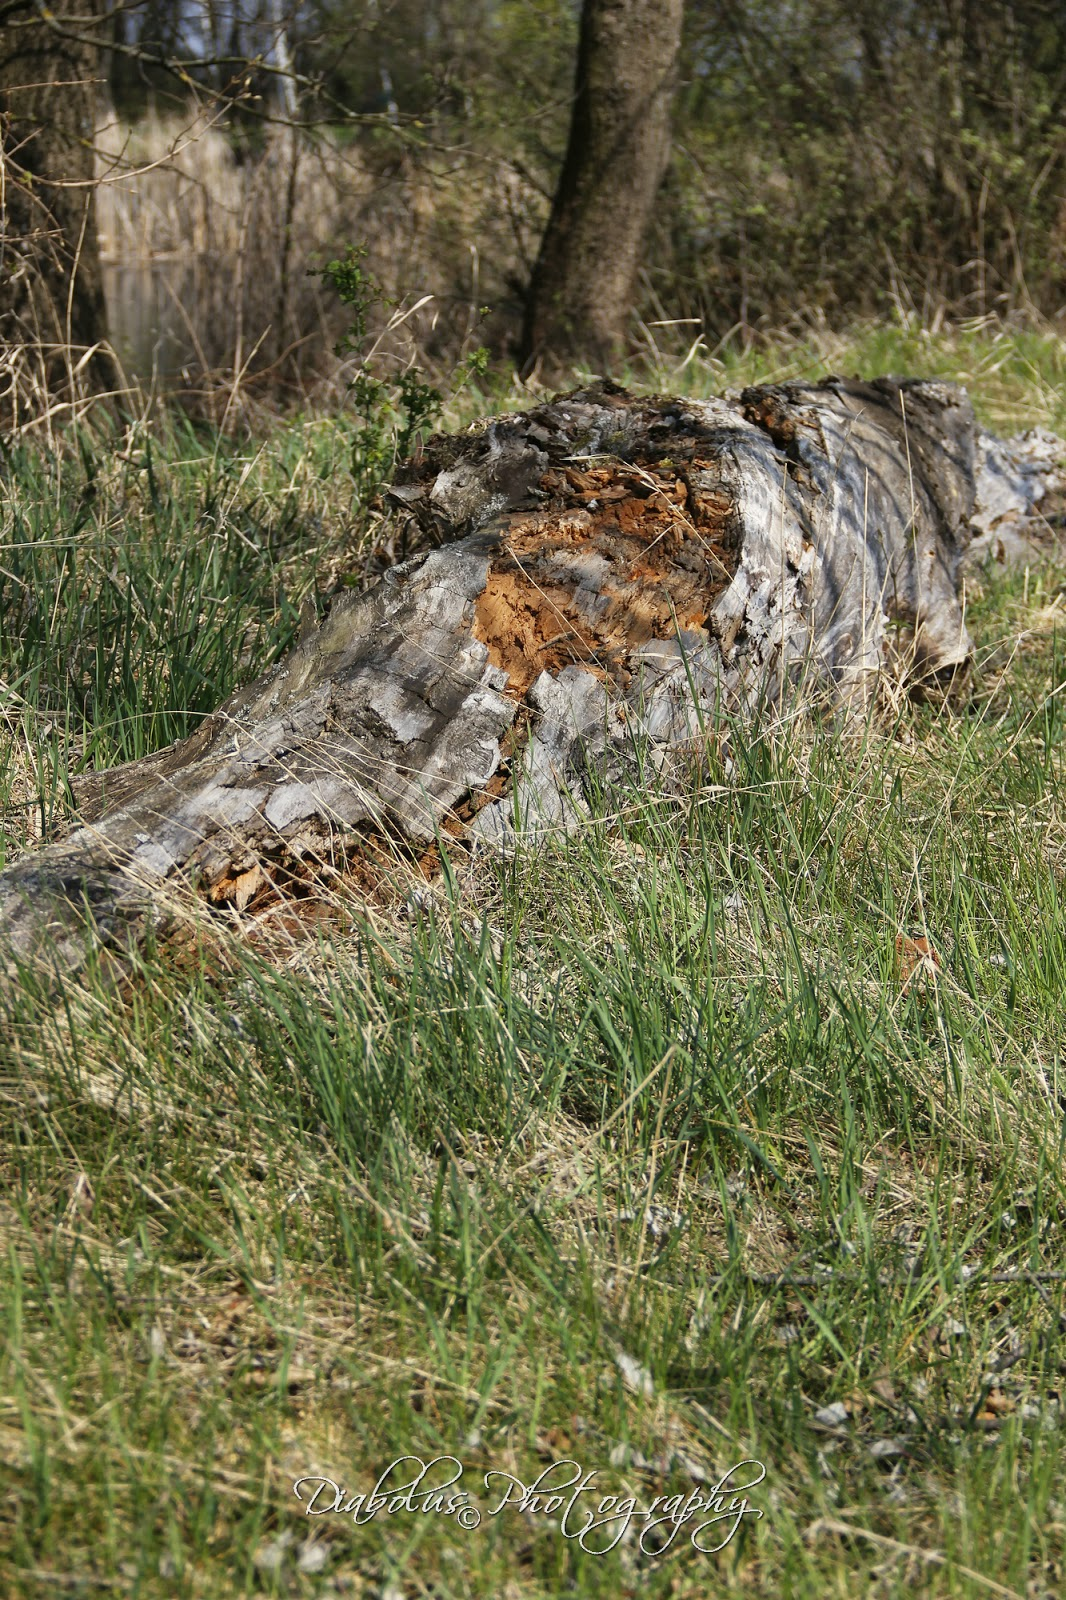 Ztrouchnivělý kmen stromu